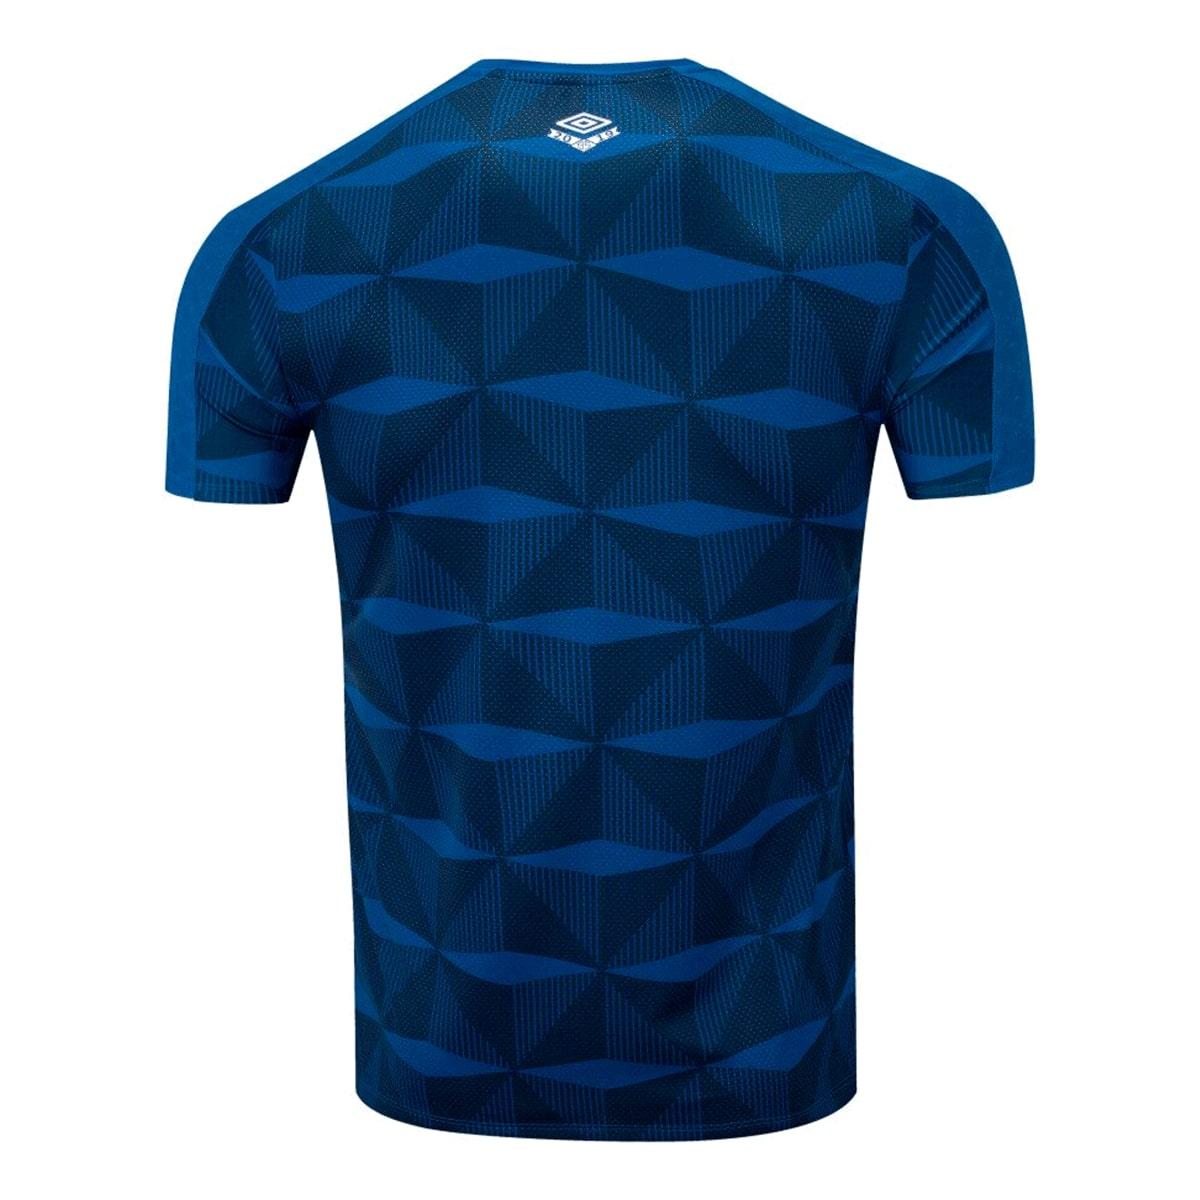 Camisa Grêmio Umbro Of. 3 19 20 SN Masculino